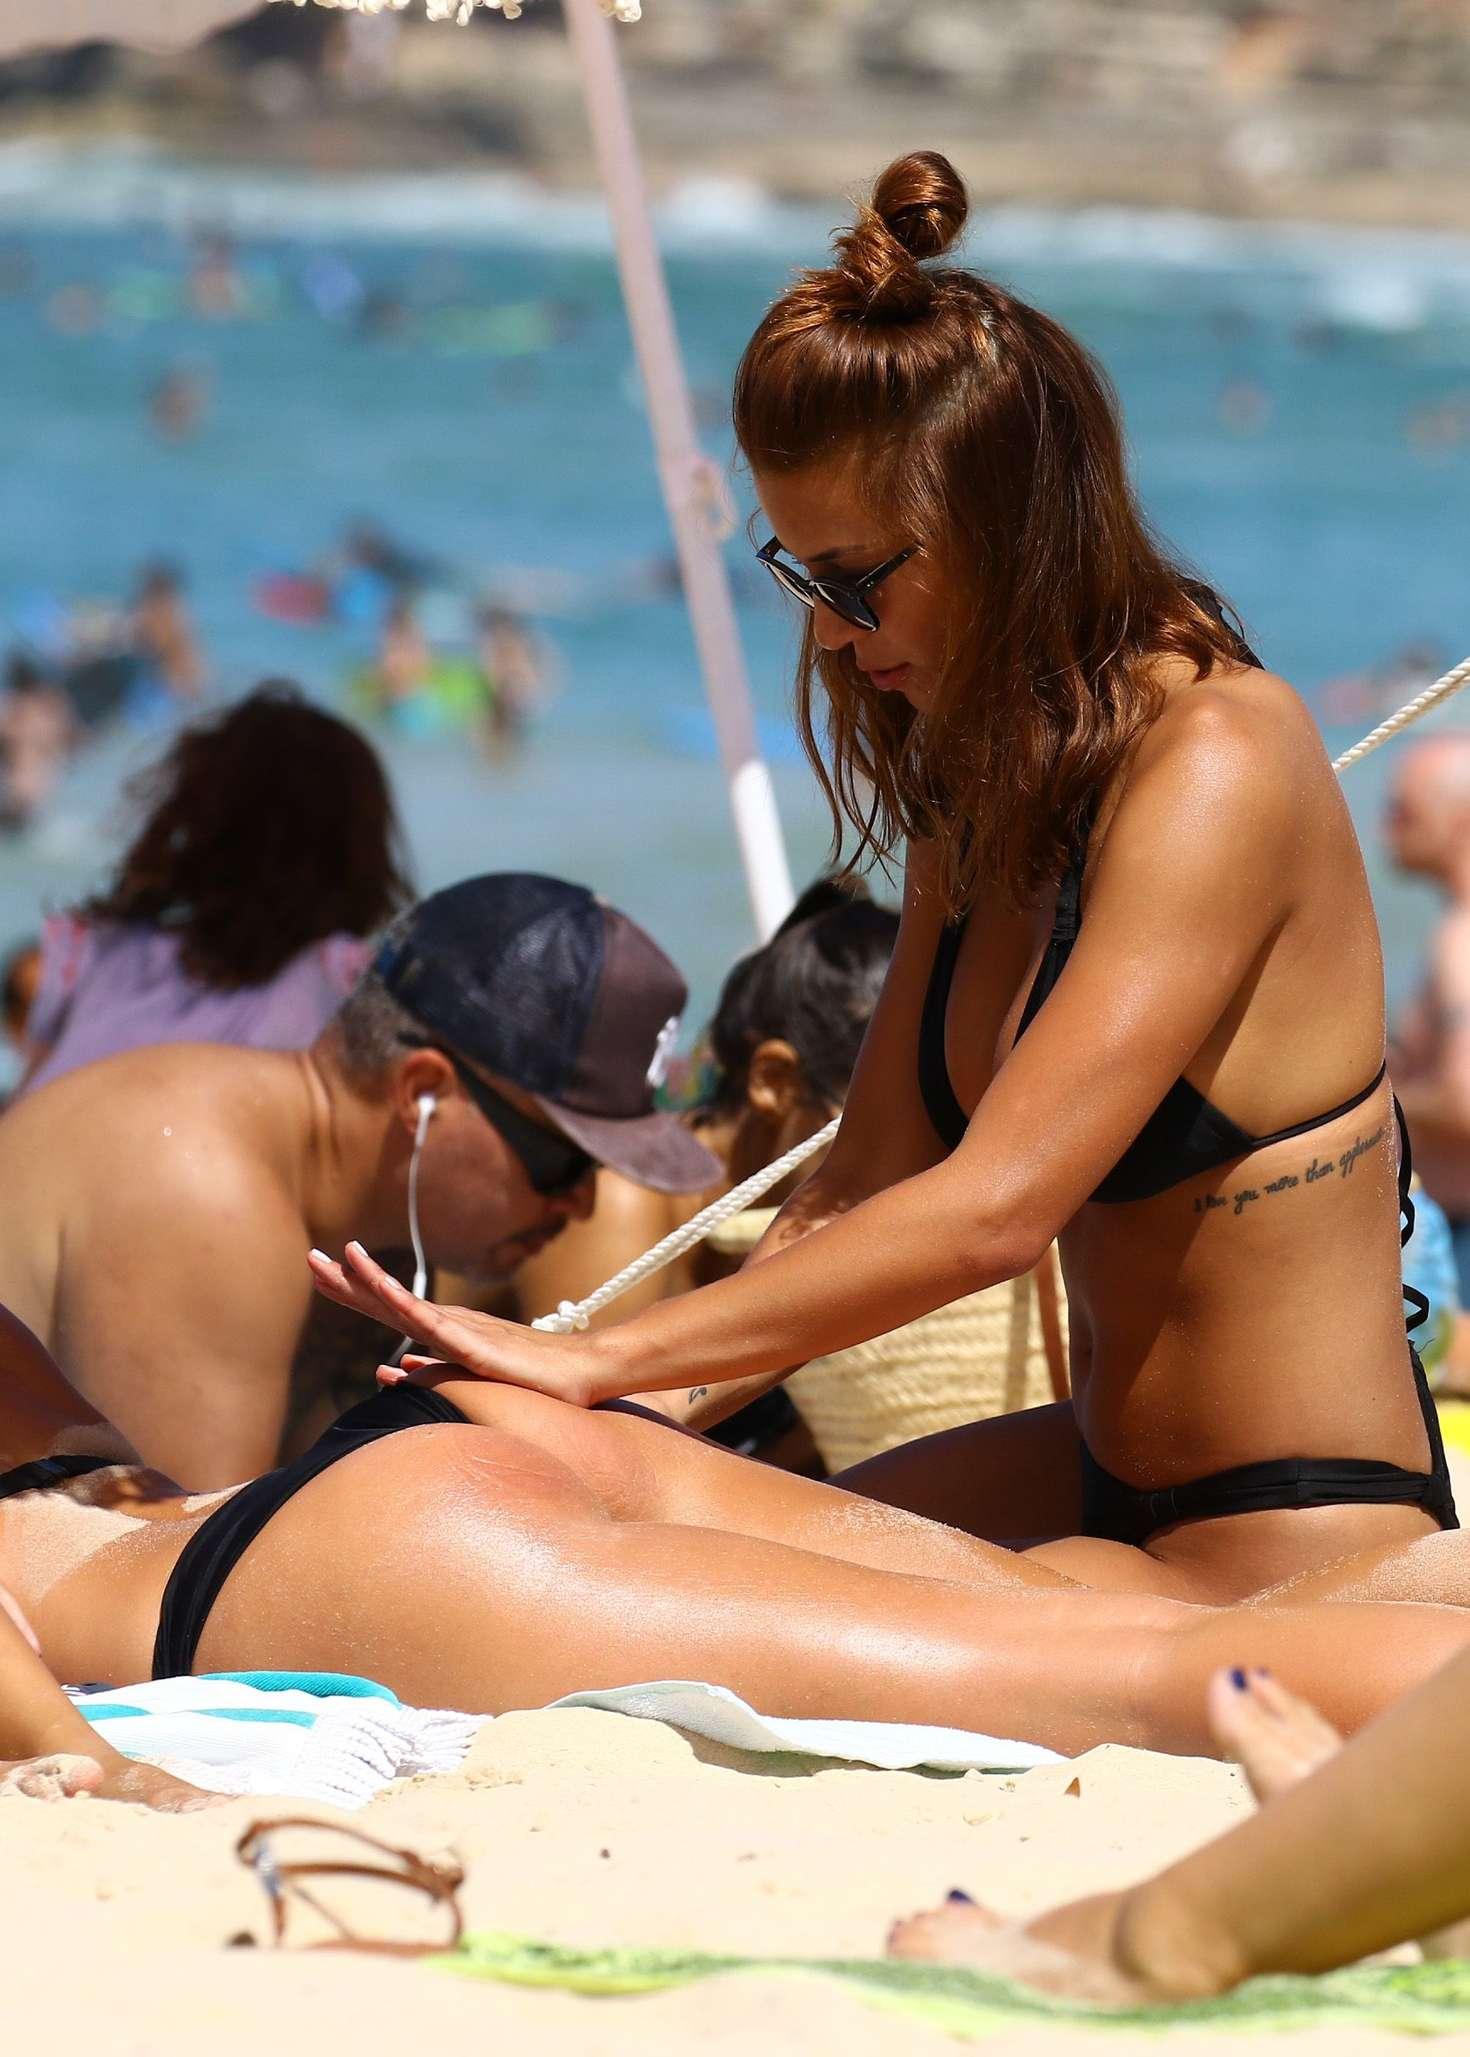 sexy-nude-on-bondi-beach-busty-amateur-riding